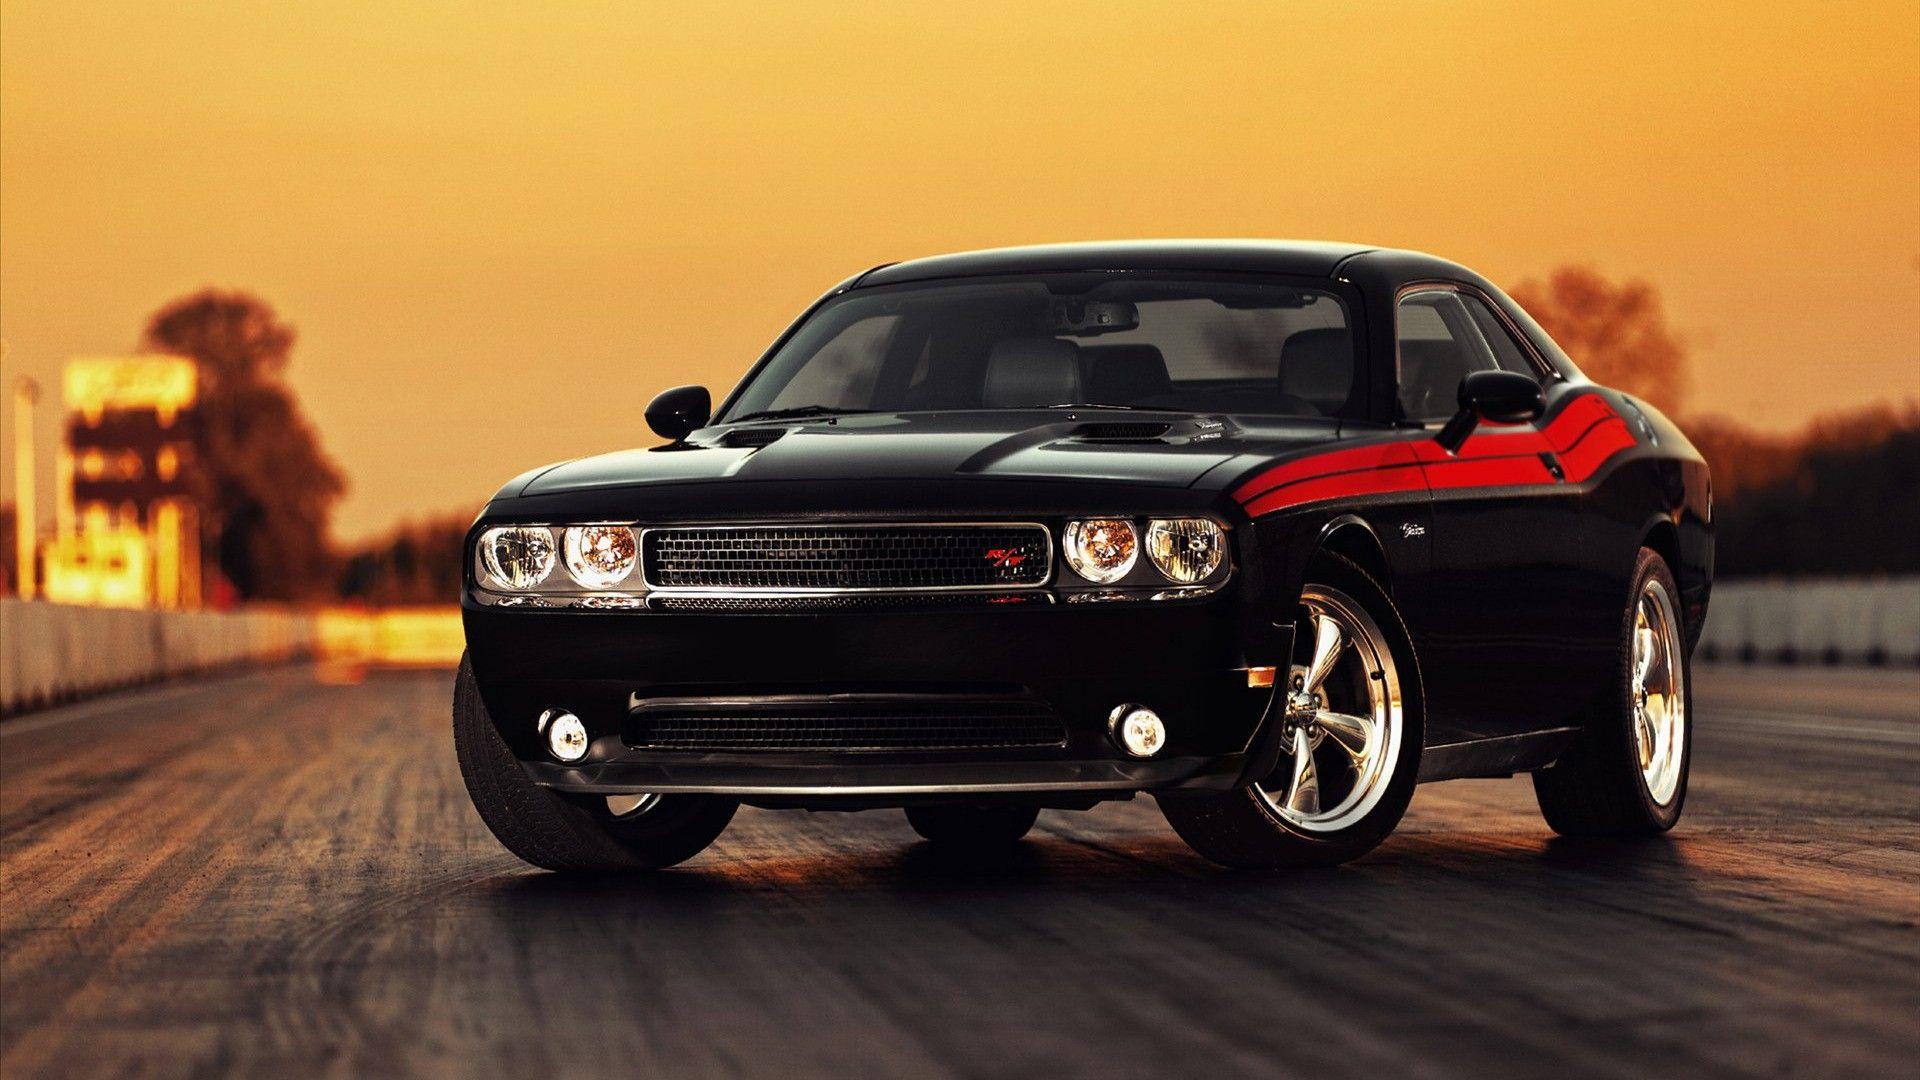 Car Insurance Company With No Credit Check Dodge Challenger 2014 Dodge Challenger 2013 Dodge Challenger